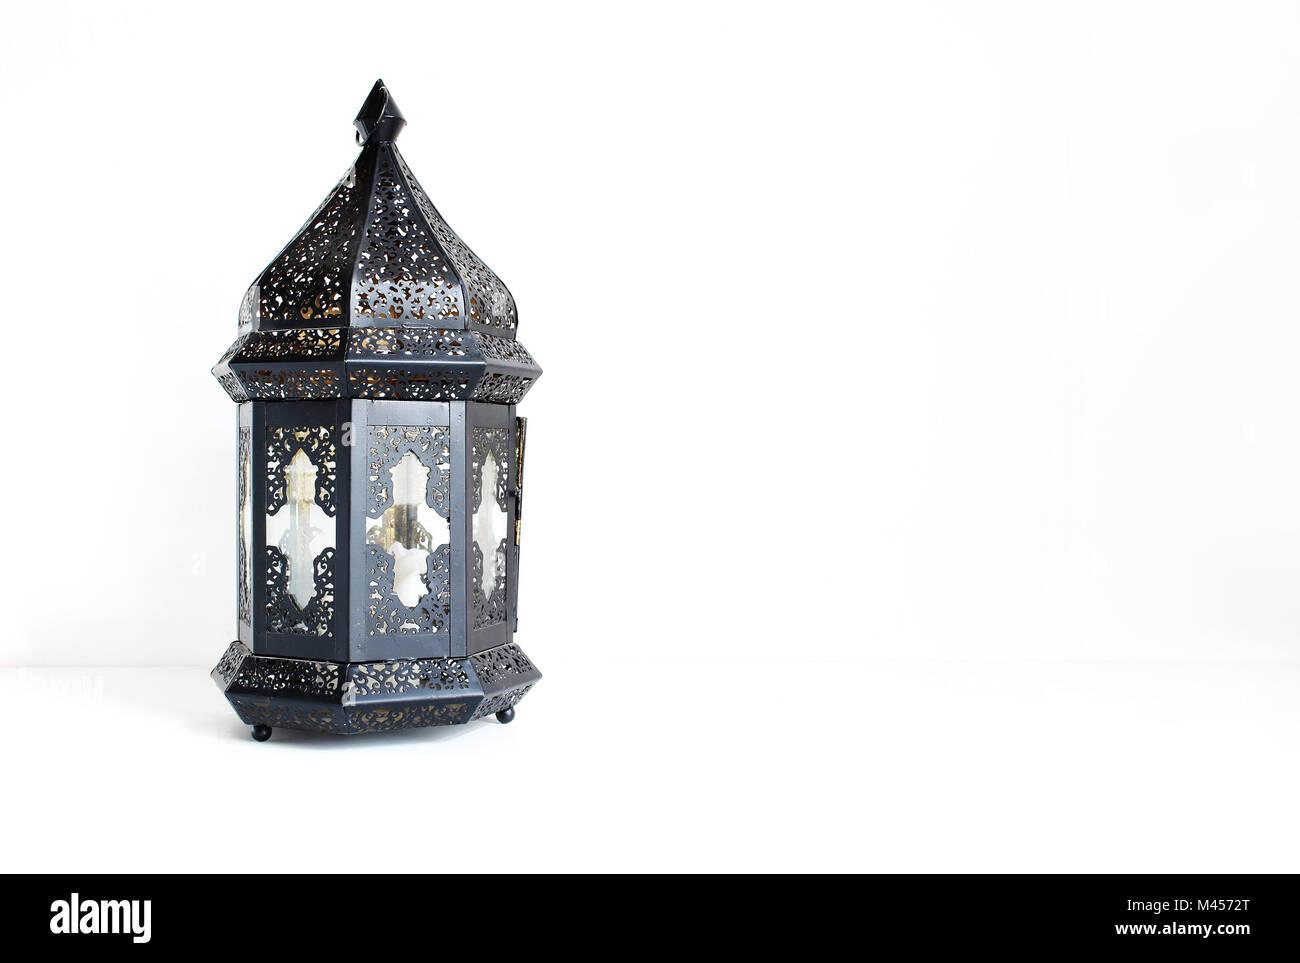 Arabic Lantern Stock Photos  for Traditional Arabic Lamp  575lpg